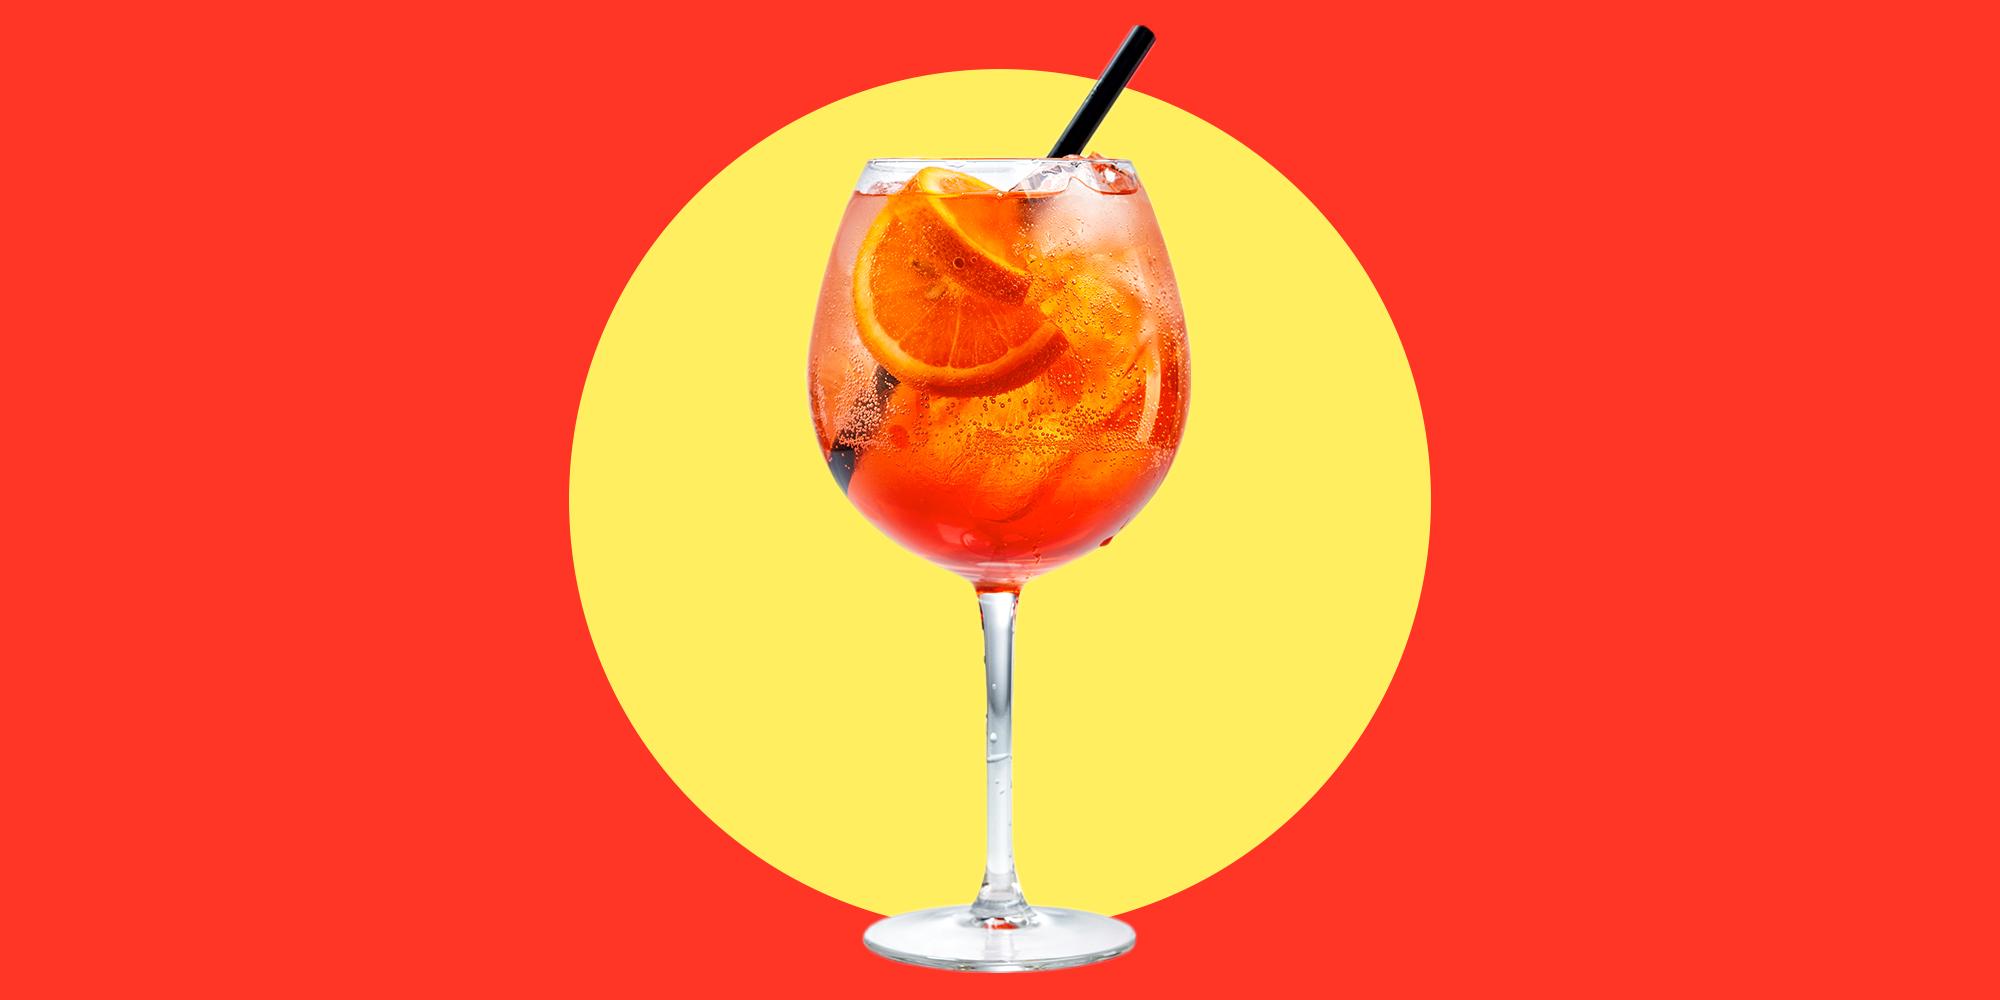 An Aperol Spritz Tastes Bad—But Spritz Culture Is Good